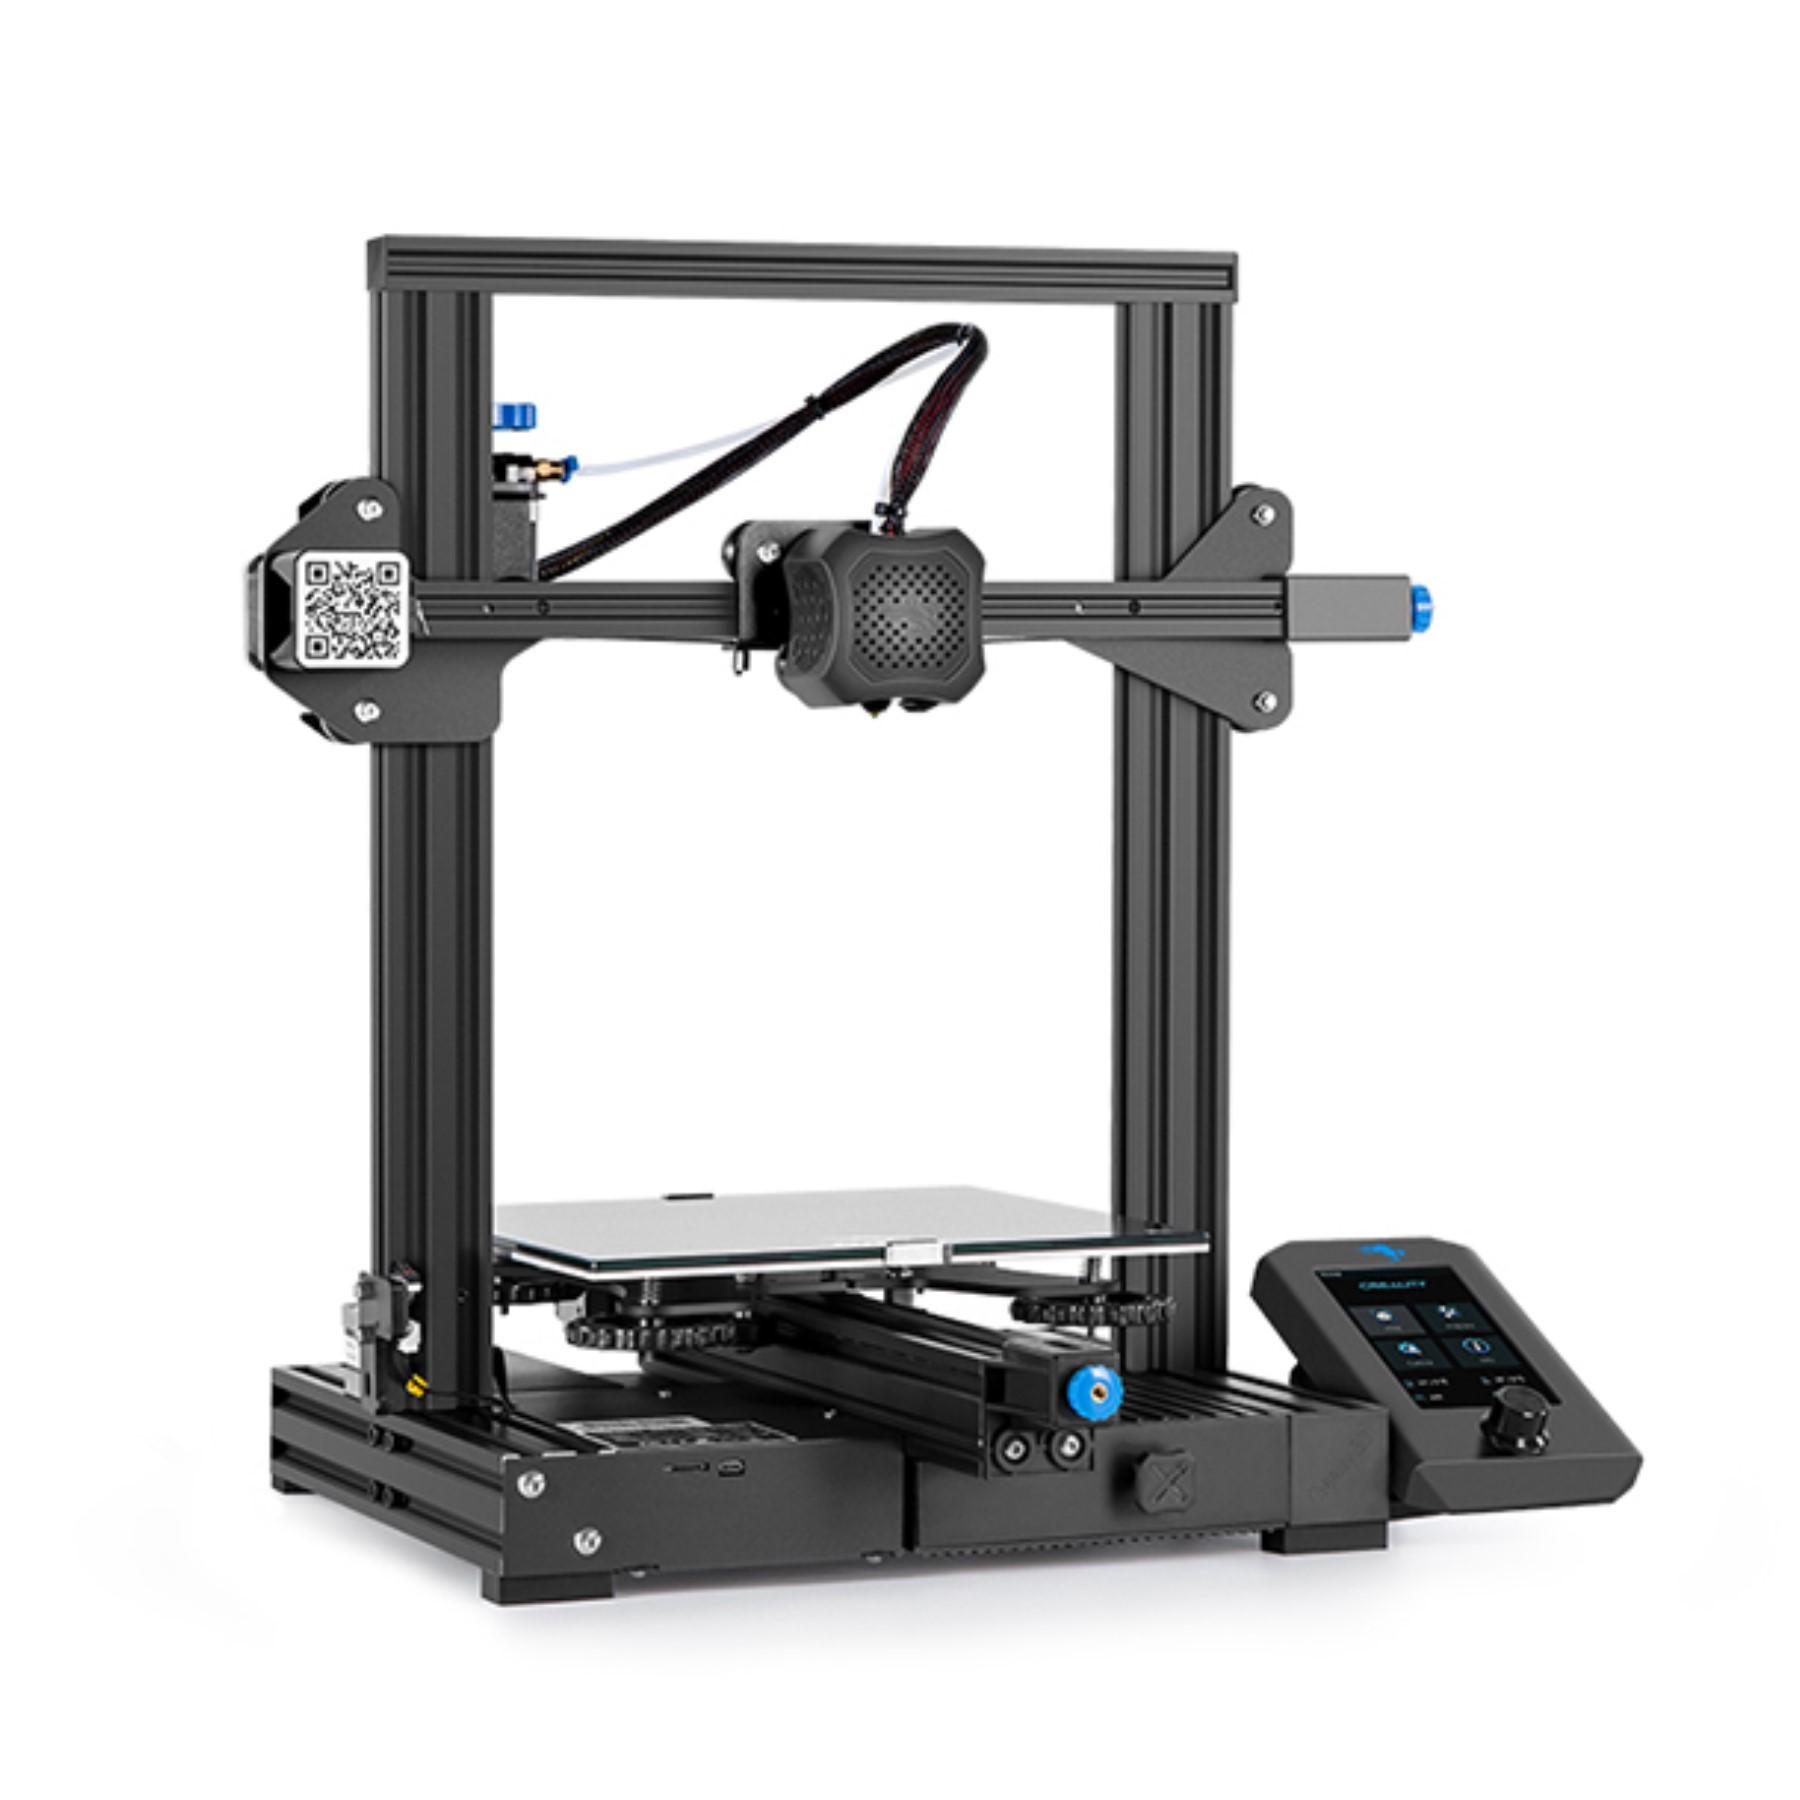 Impresora 3D ENDER-3 V2